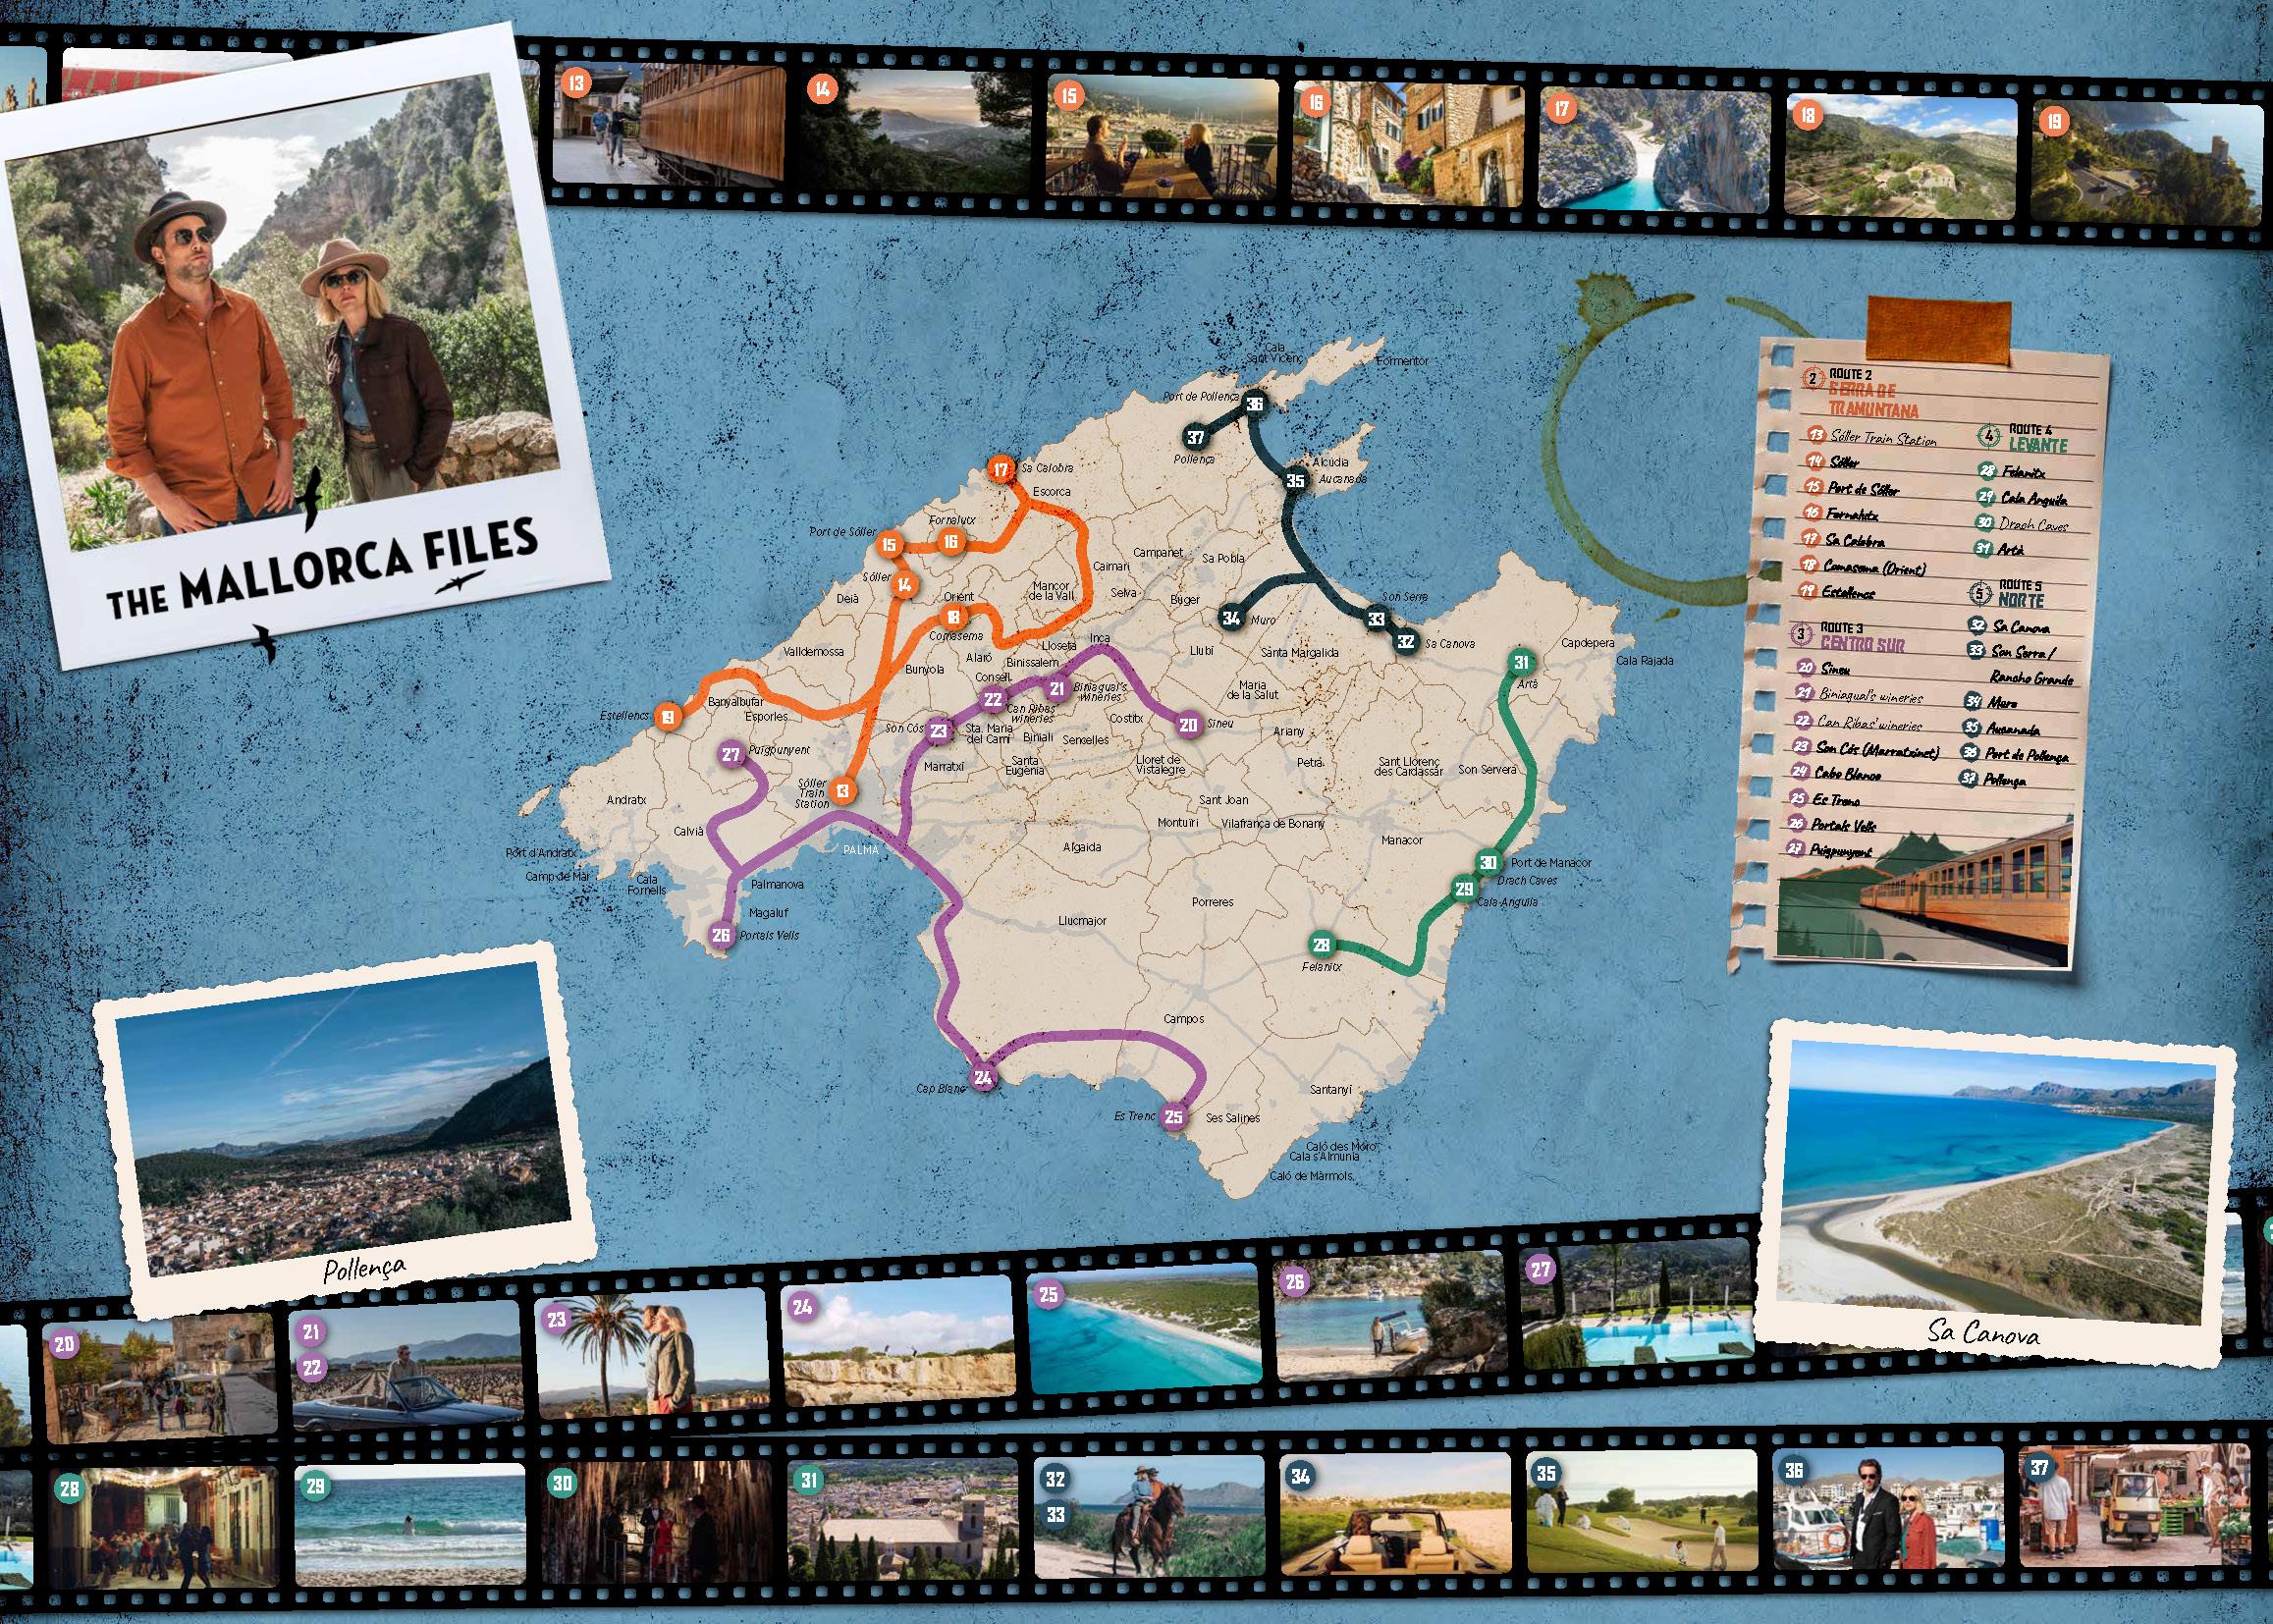 The-Mallorca-Files-Movie-Map_Page_1